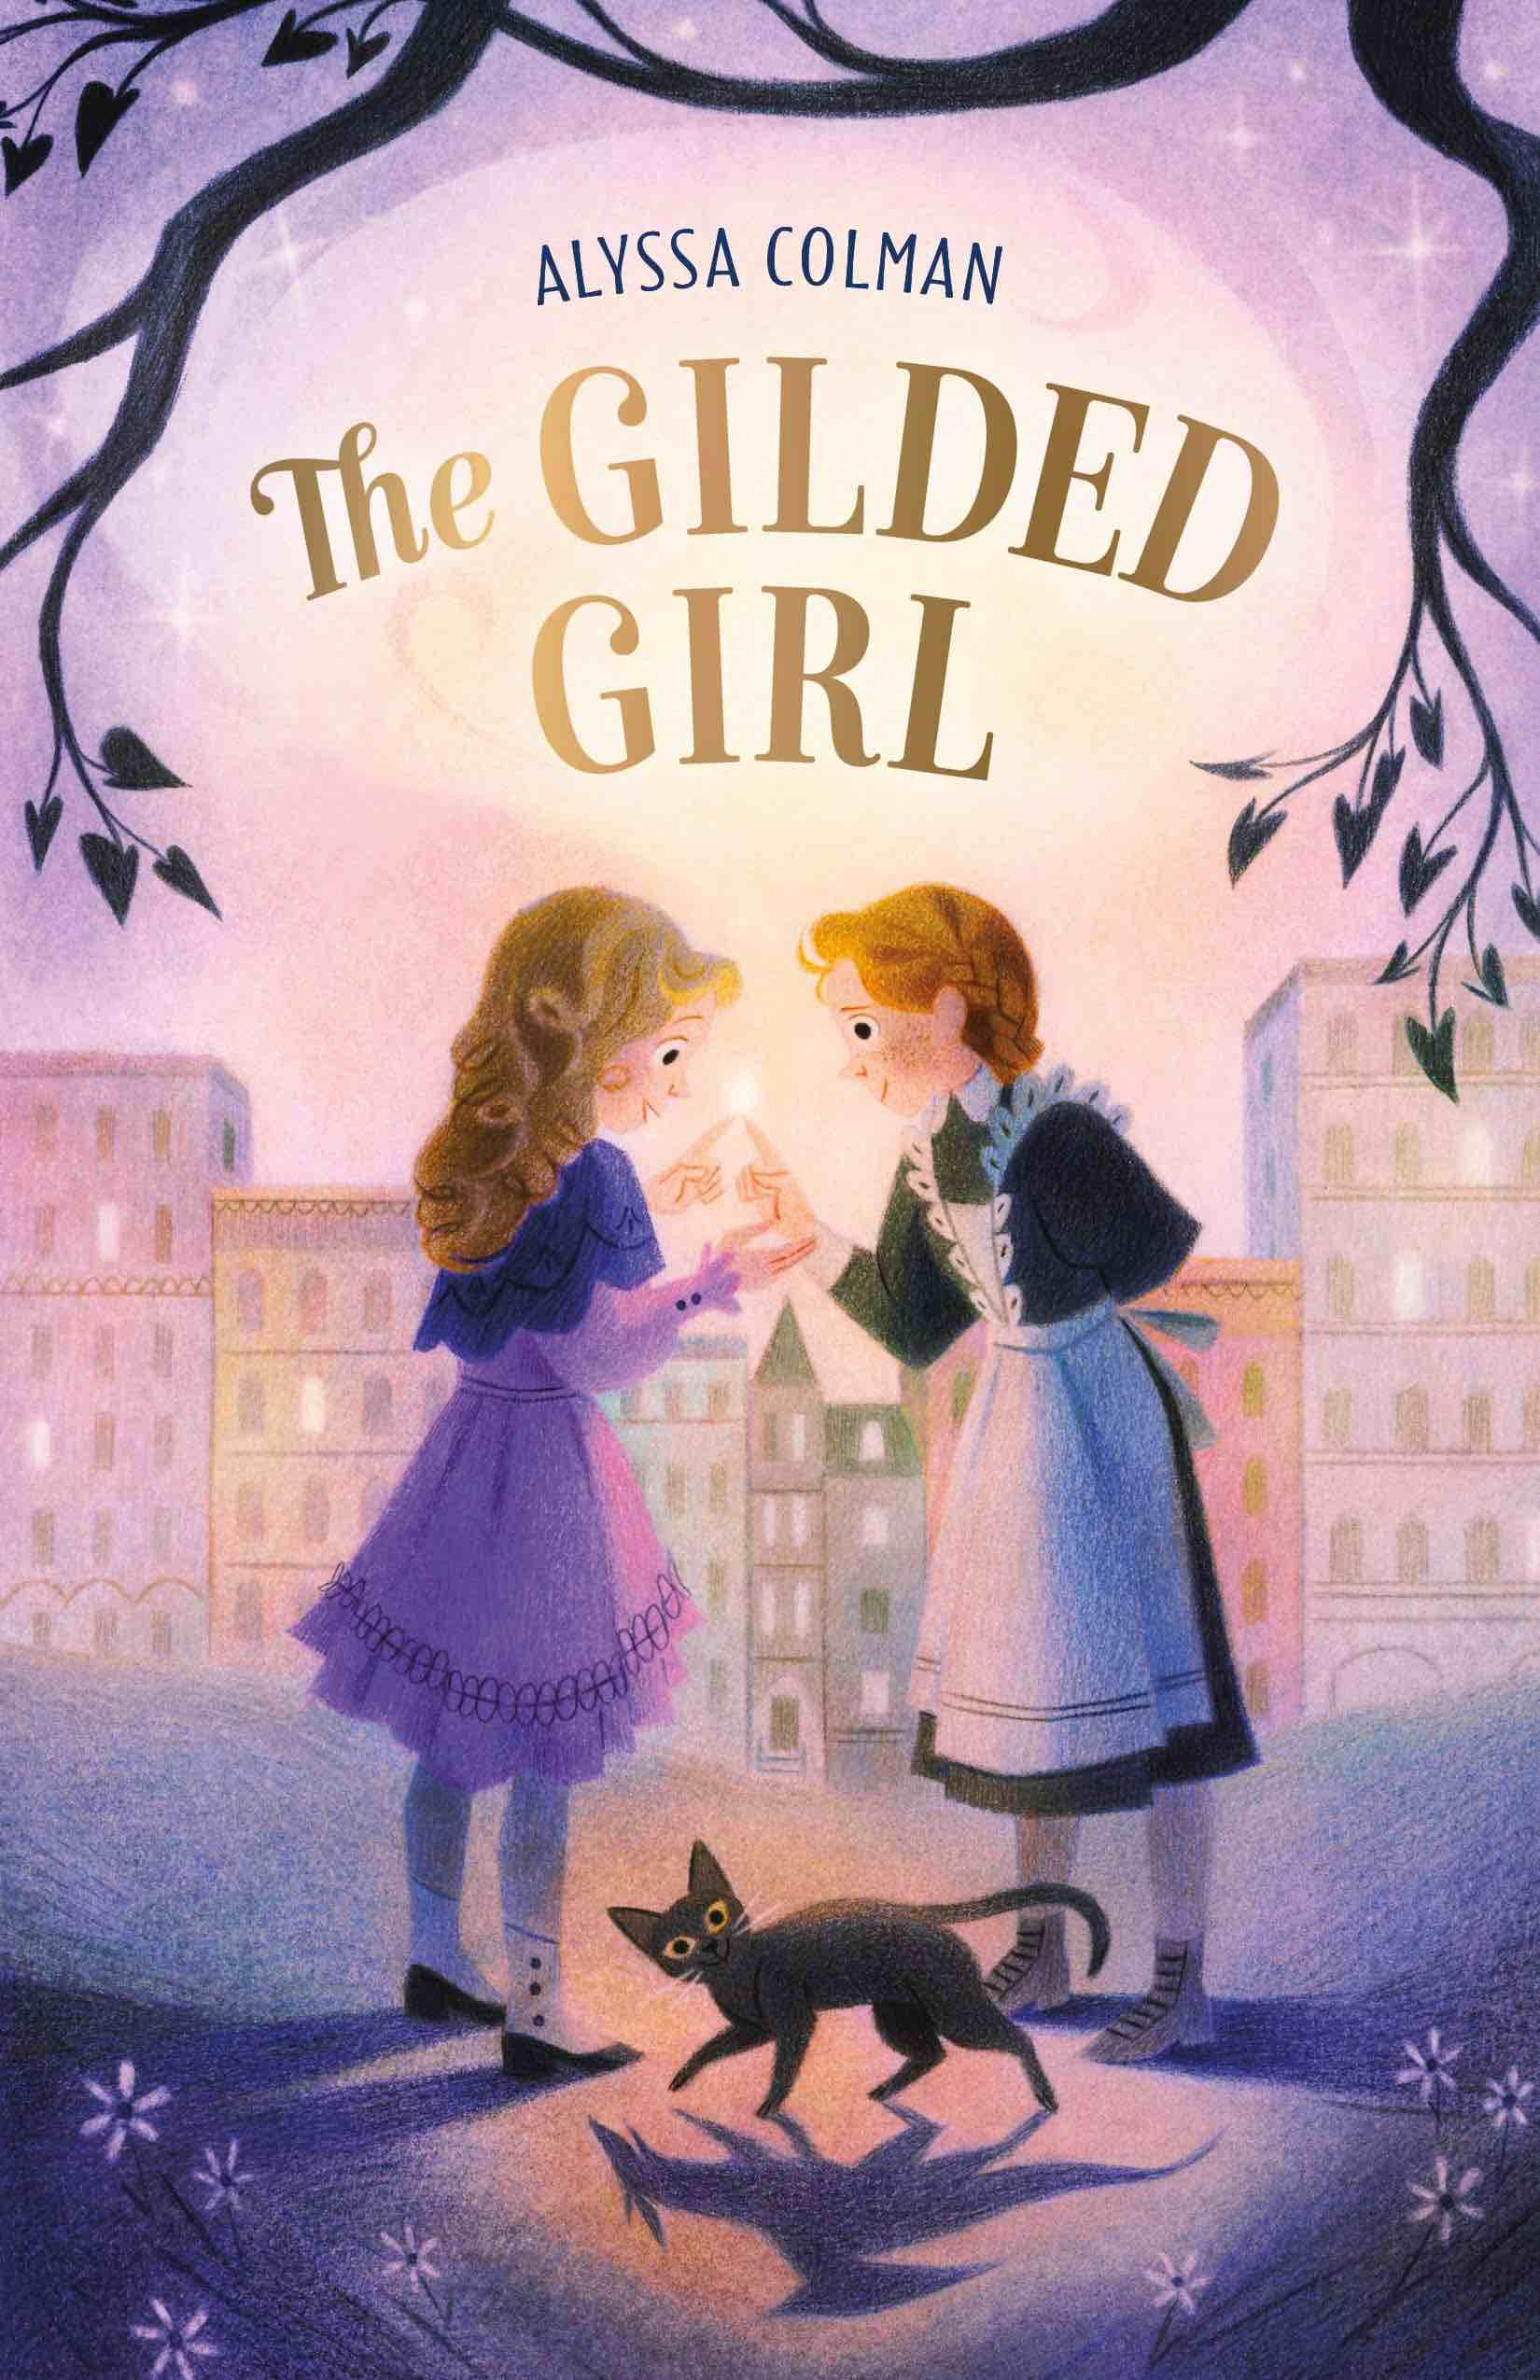 Gilded Girl Alyssa Colman